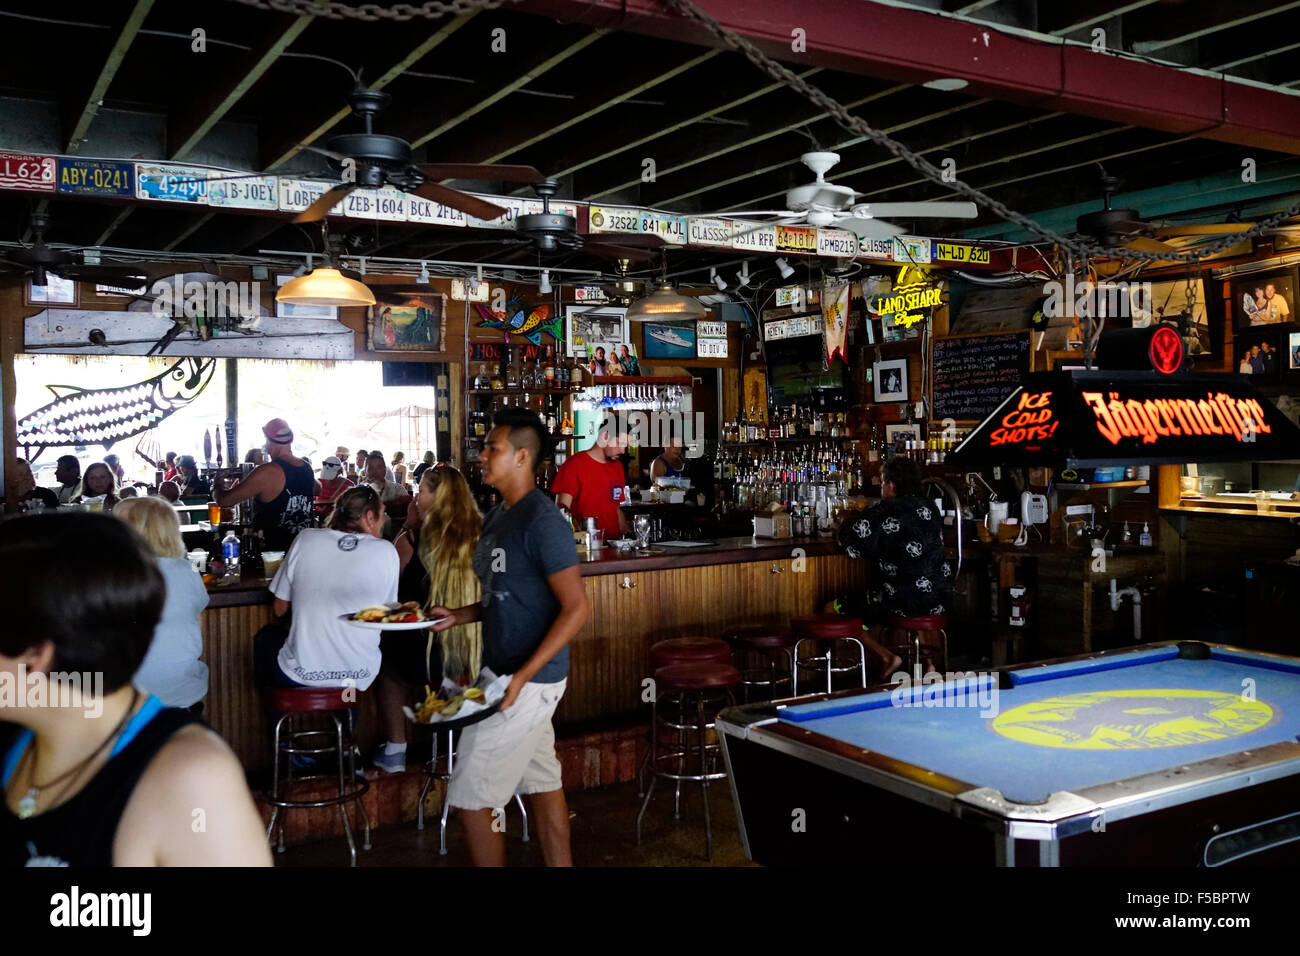 HogFish Bar Grill Key West Florida USA Pool Table Bar And - Pool table key